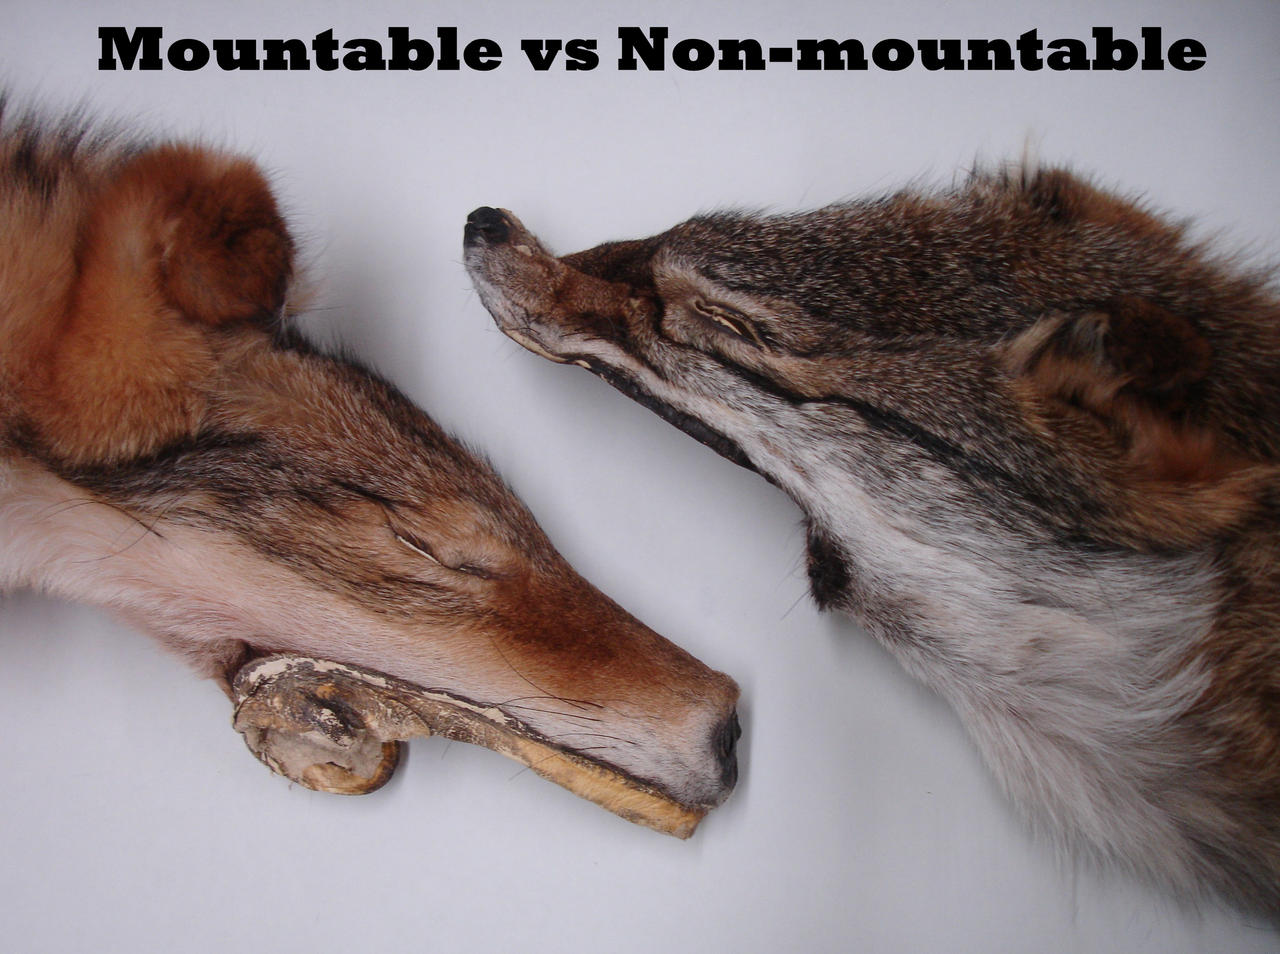 Mountable VS Non-Mountable by AcidConfetti